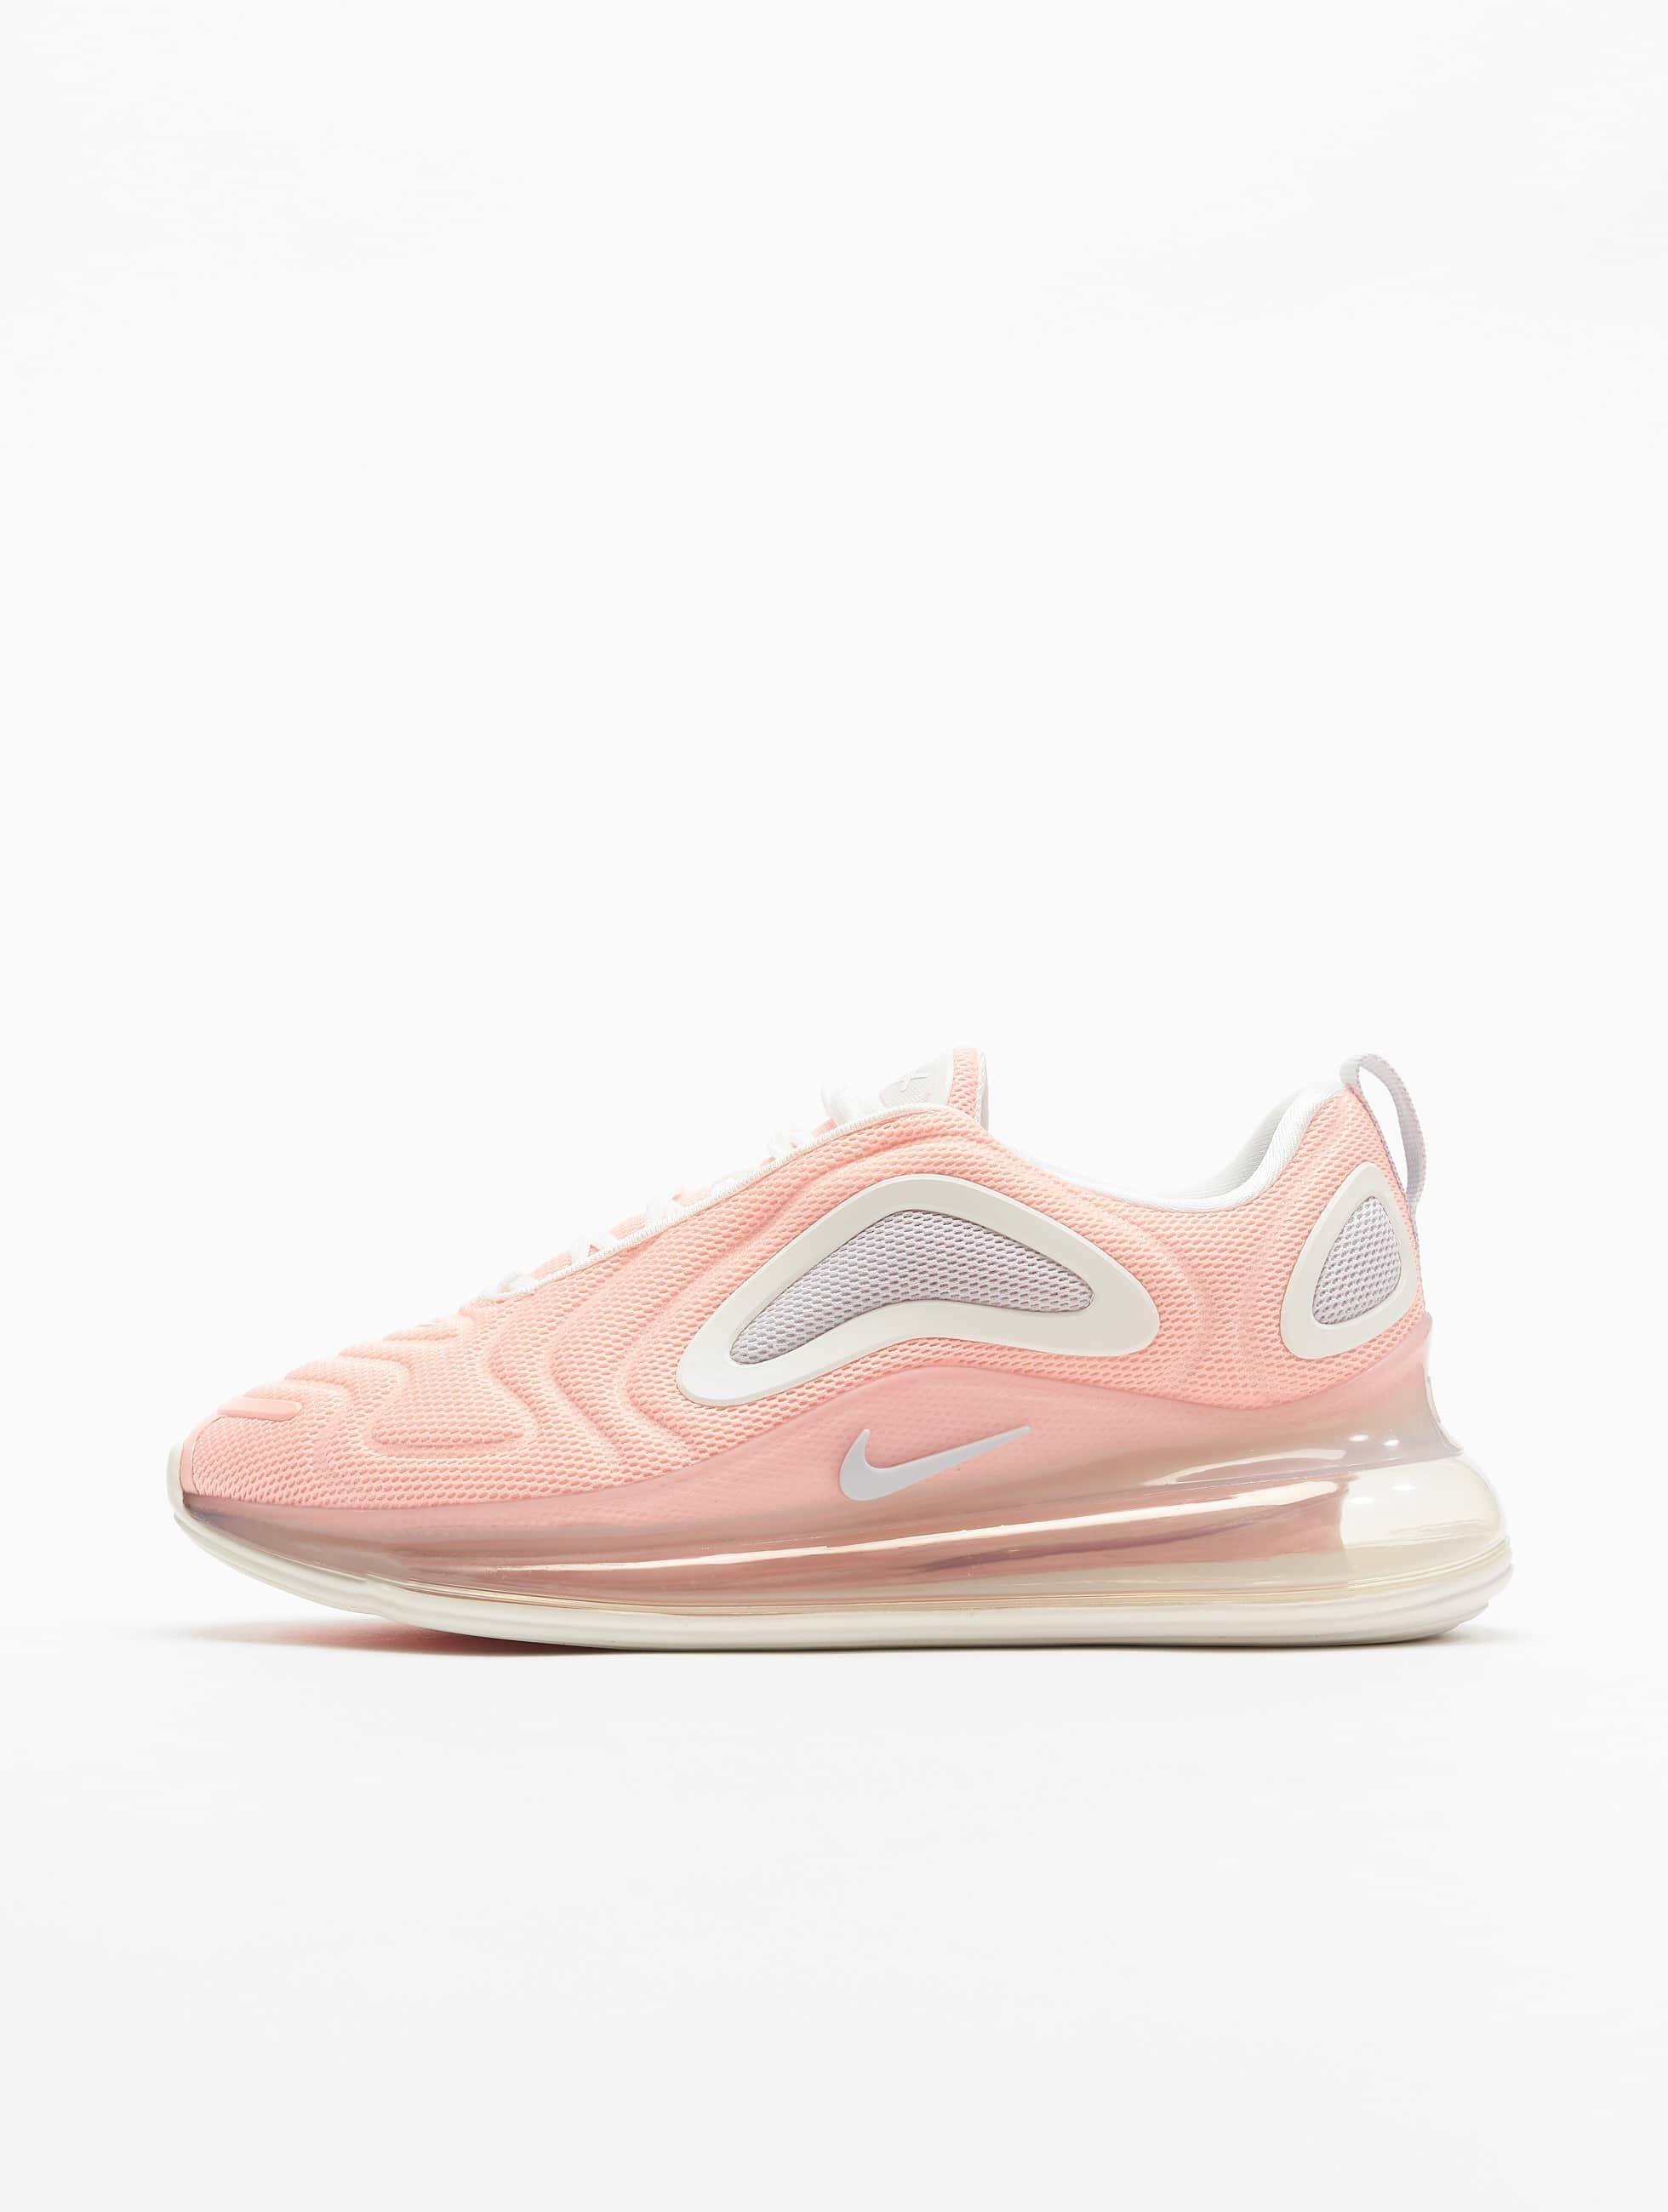 Nike Air Max 200 Sneakers Light Soft PinkWhiteSummit White